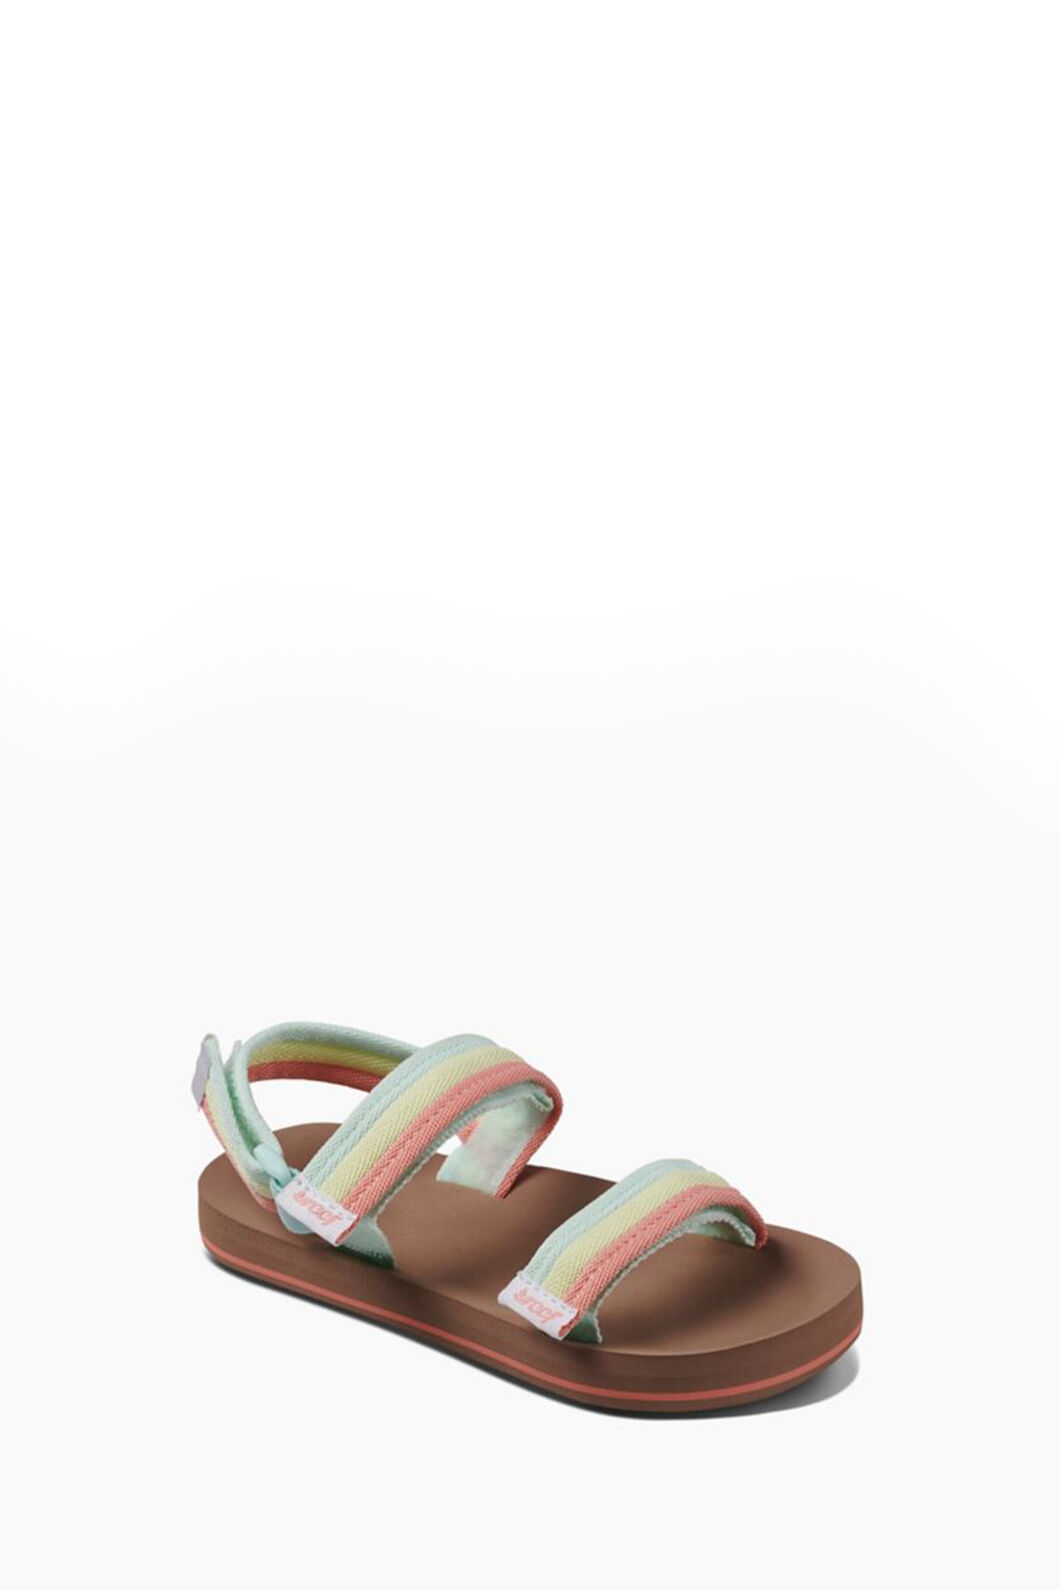 Reef Little Ahi Convertible Sandals — Kids', Rai, hi-res